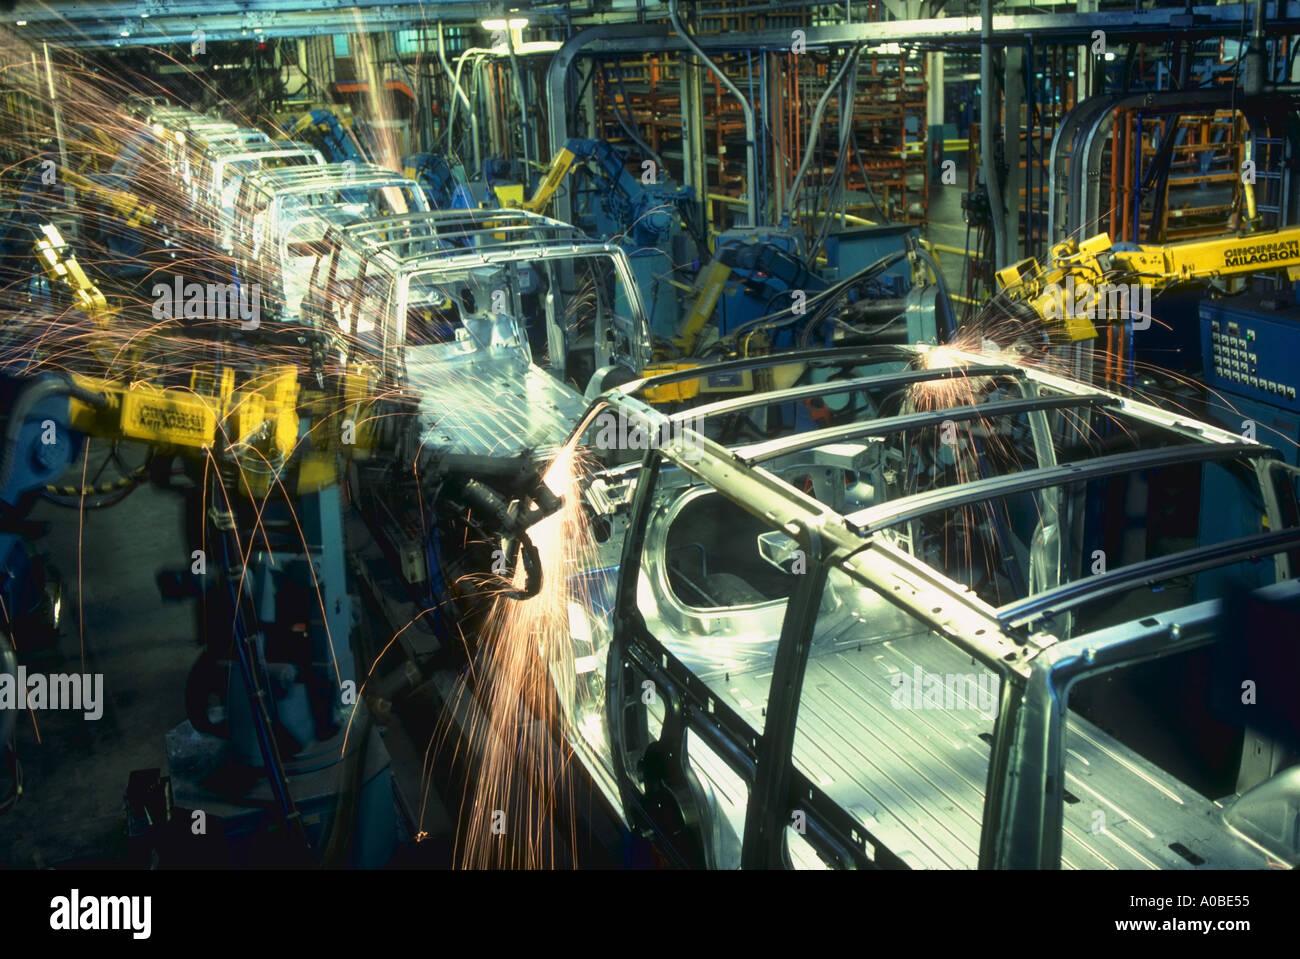 Robots weld van bodies at general motors plant in Baltimore Maryland - Stock Image